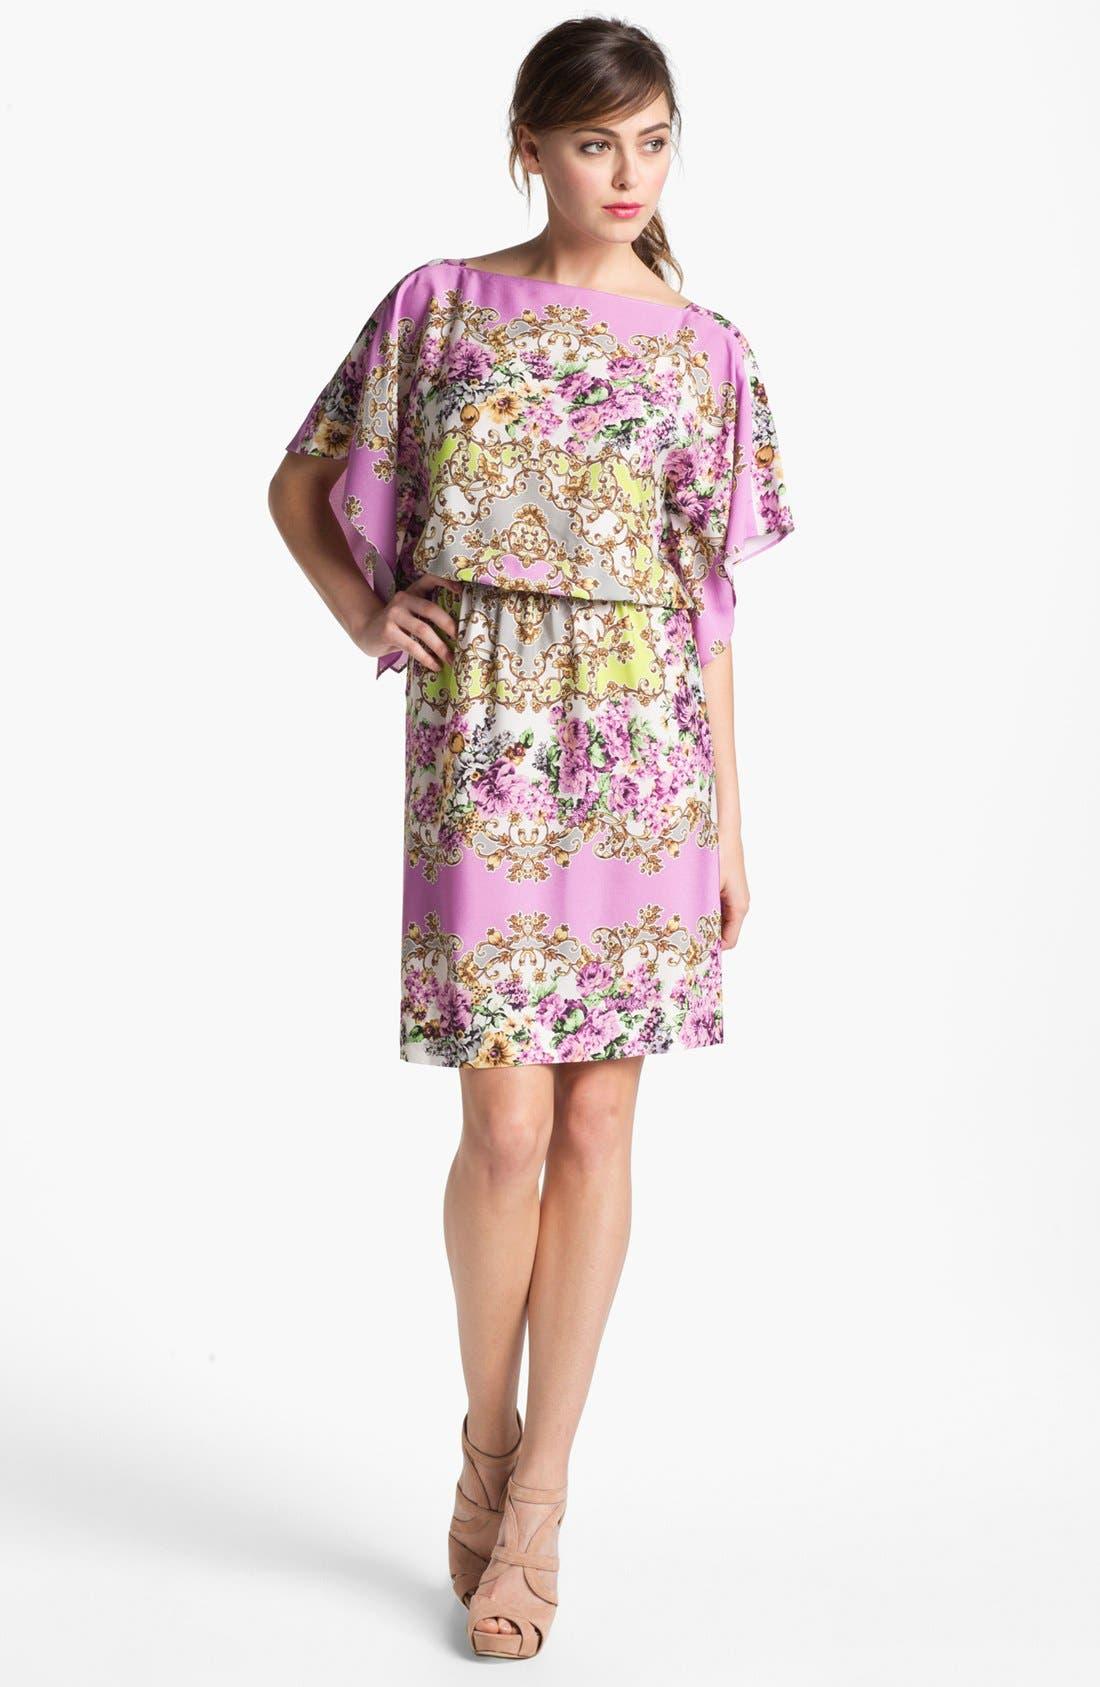 Alternate Image 1 Selected - Maggy London Floral Print Blouson Jersey Dress